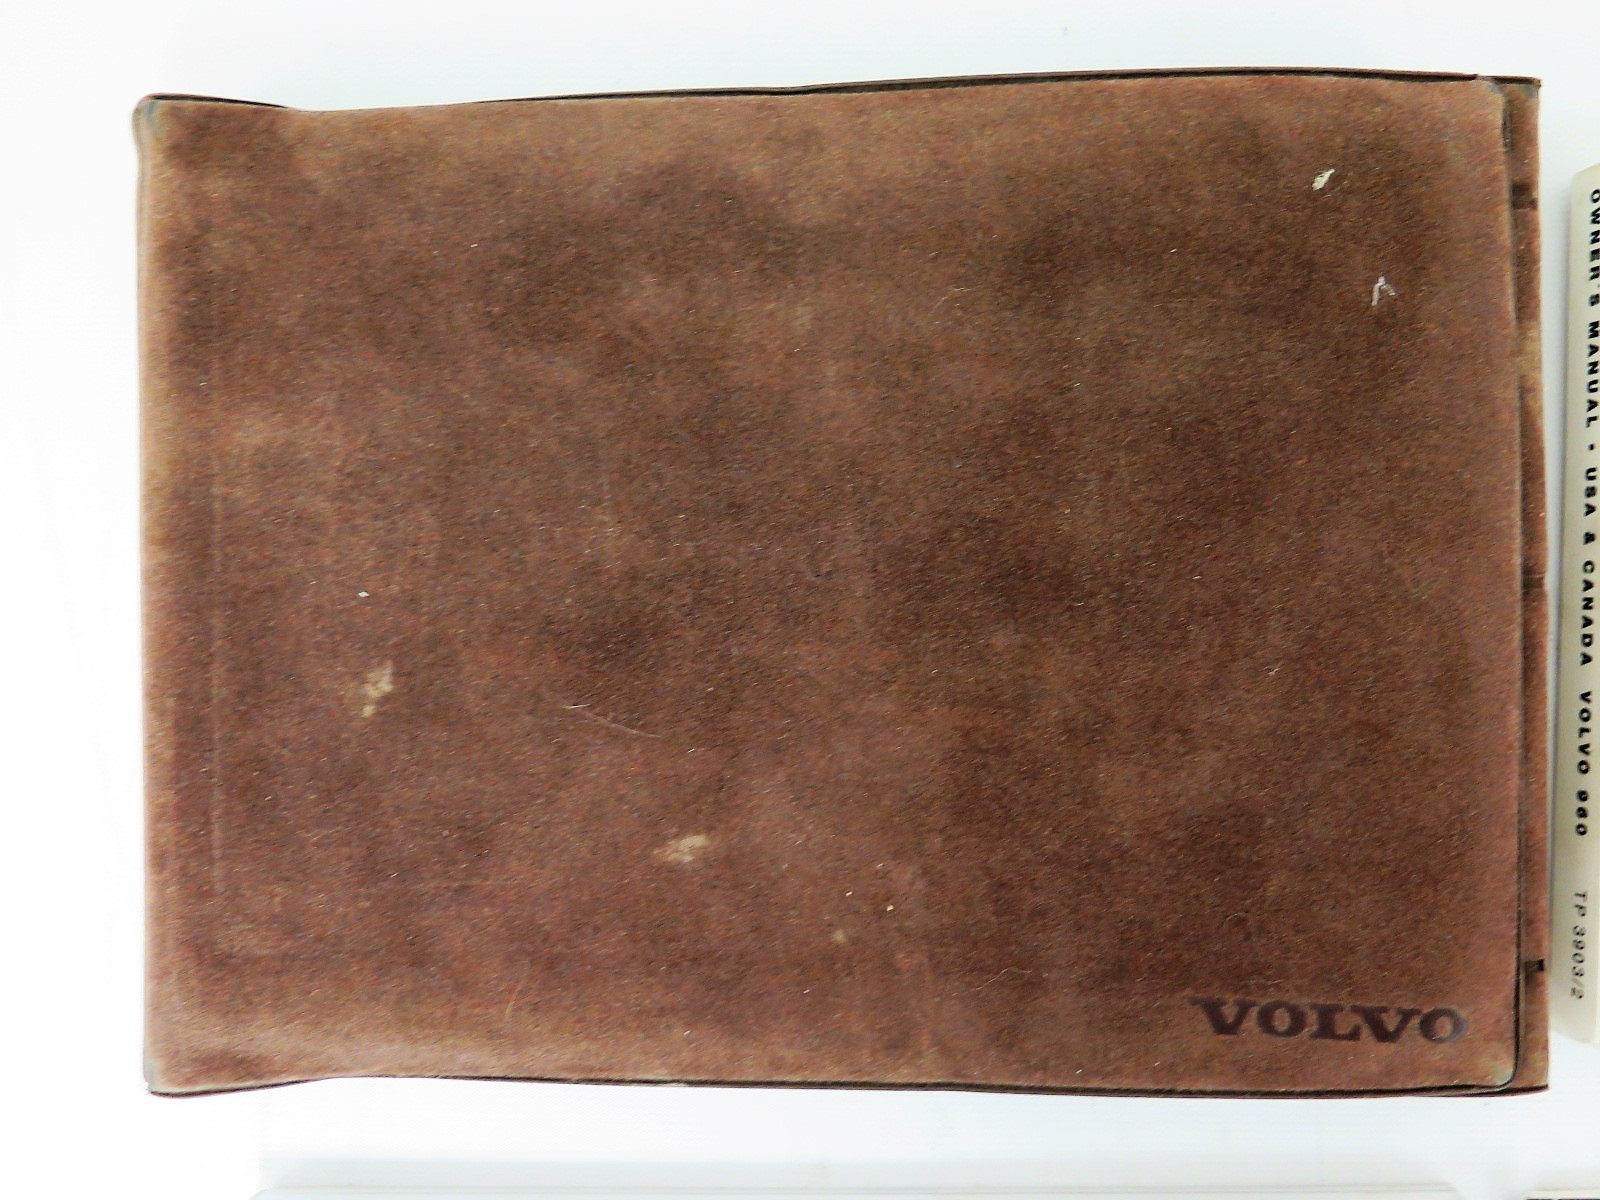 1997 volvo 960 owners manual book bashful yak rh bashfulyak com 1996 Volvo 960 Interior 1996 Volvo 960 PNP Switch